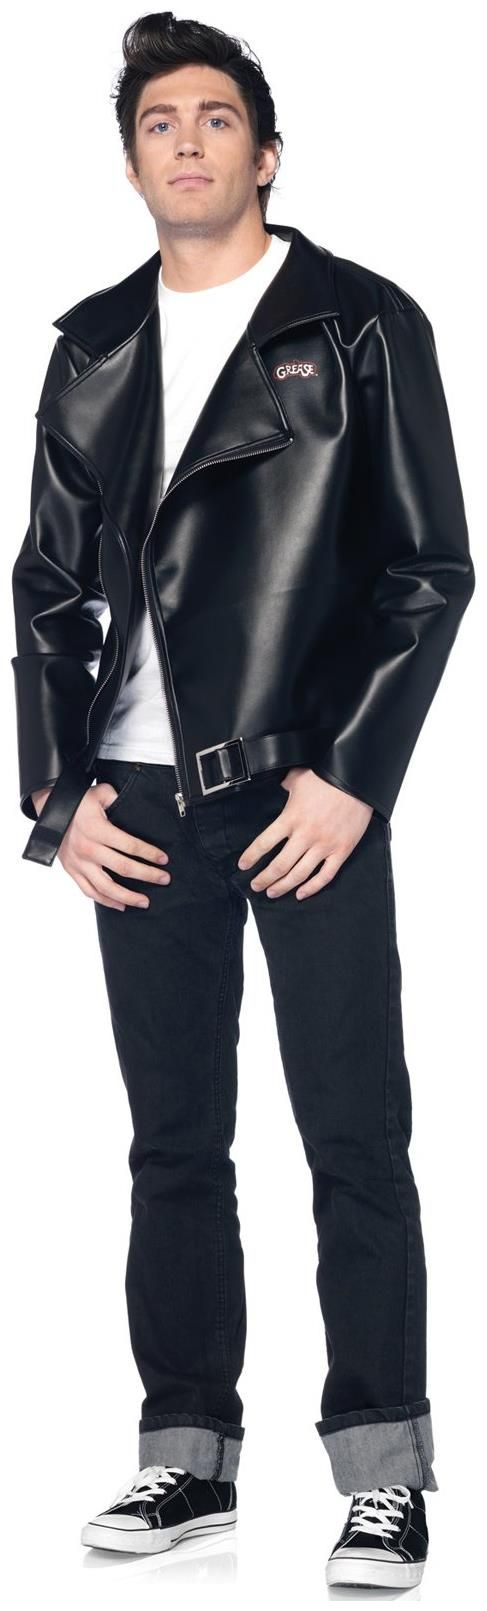 Grease - Danny Zuko Adult Costume